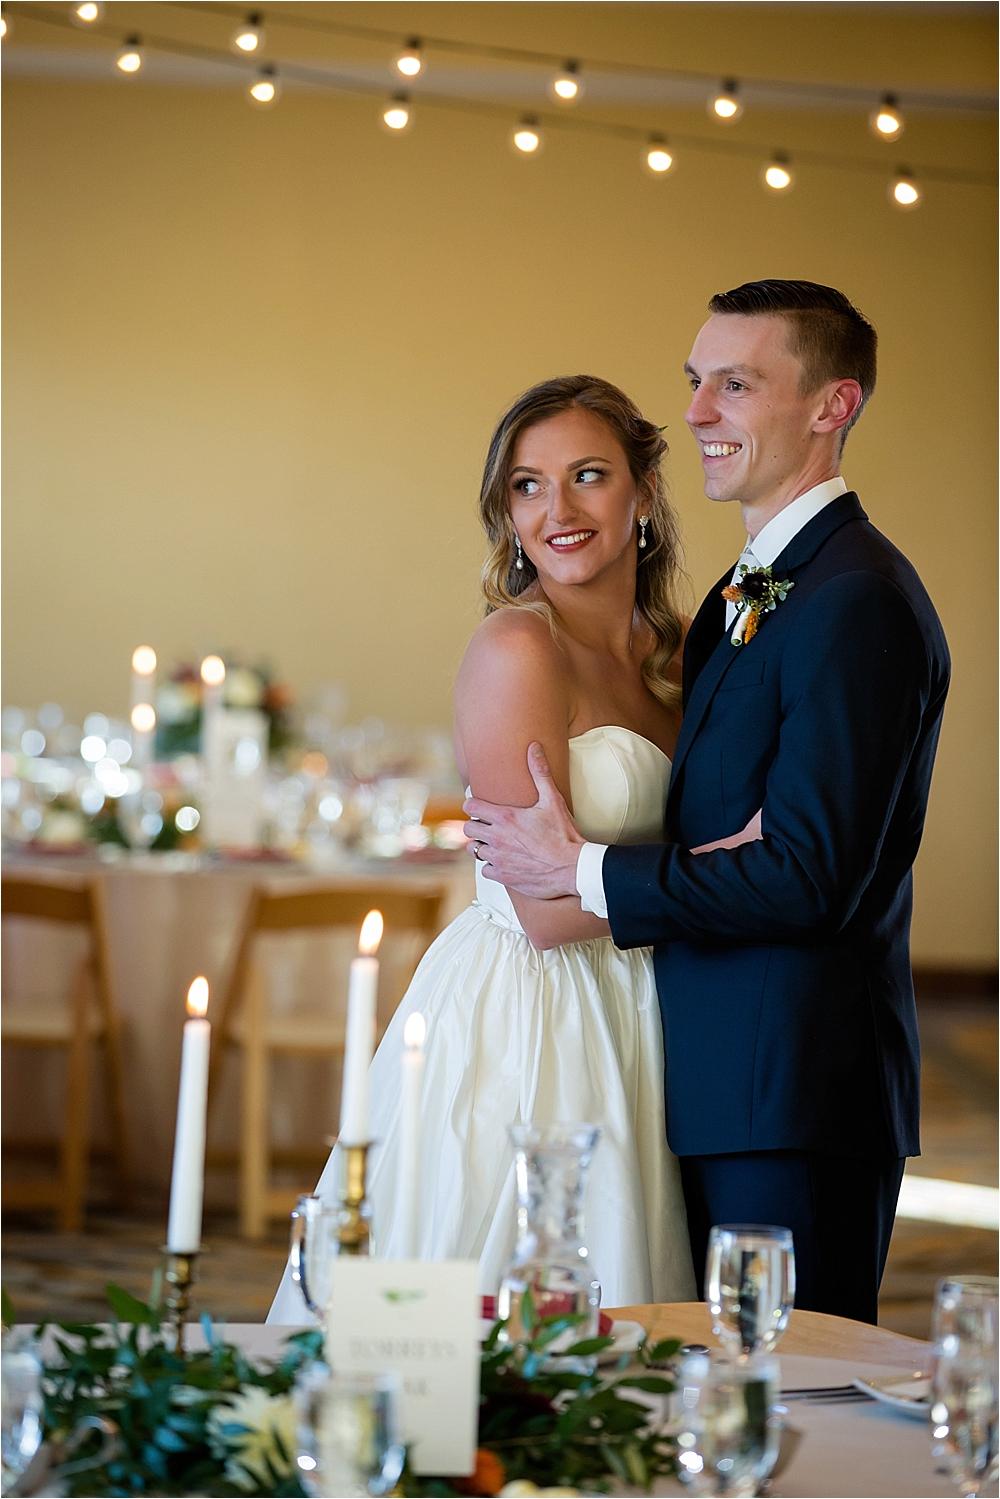 Abby + Martin's Breckenridge Wedding_0041.jpg